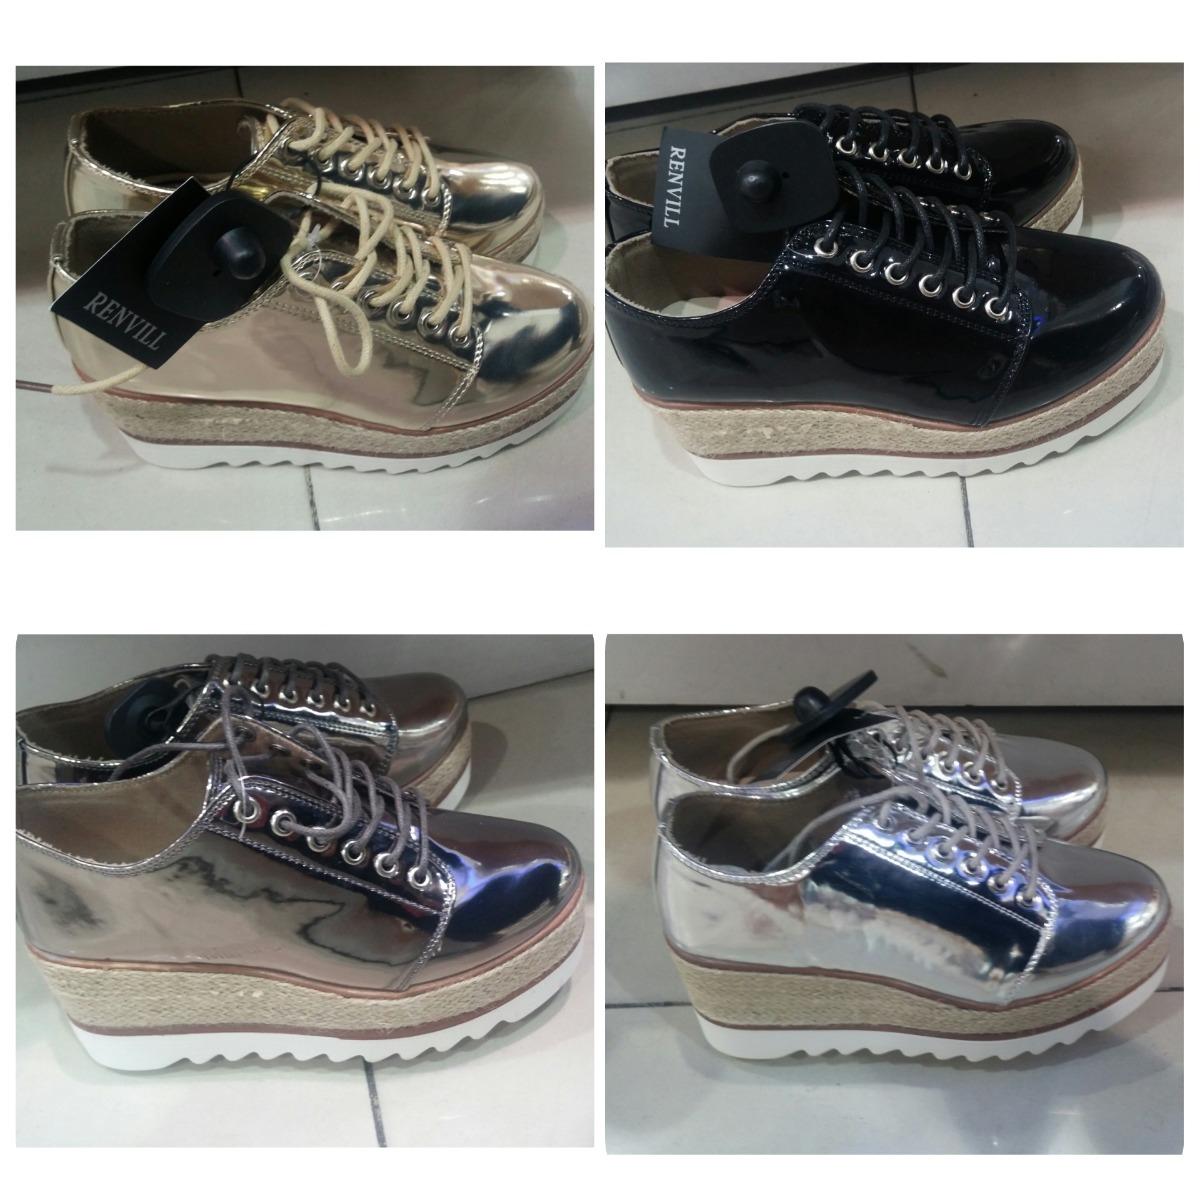 83538d36d5478 zapatos de plataforma oxford dama moda brillantes. Cargando zoom.